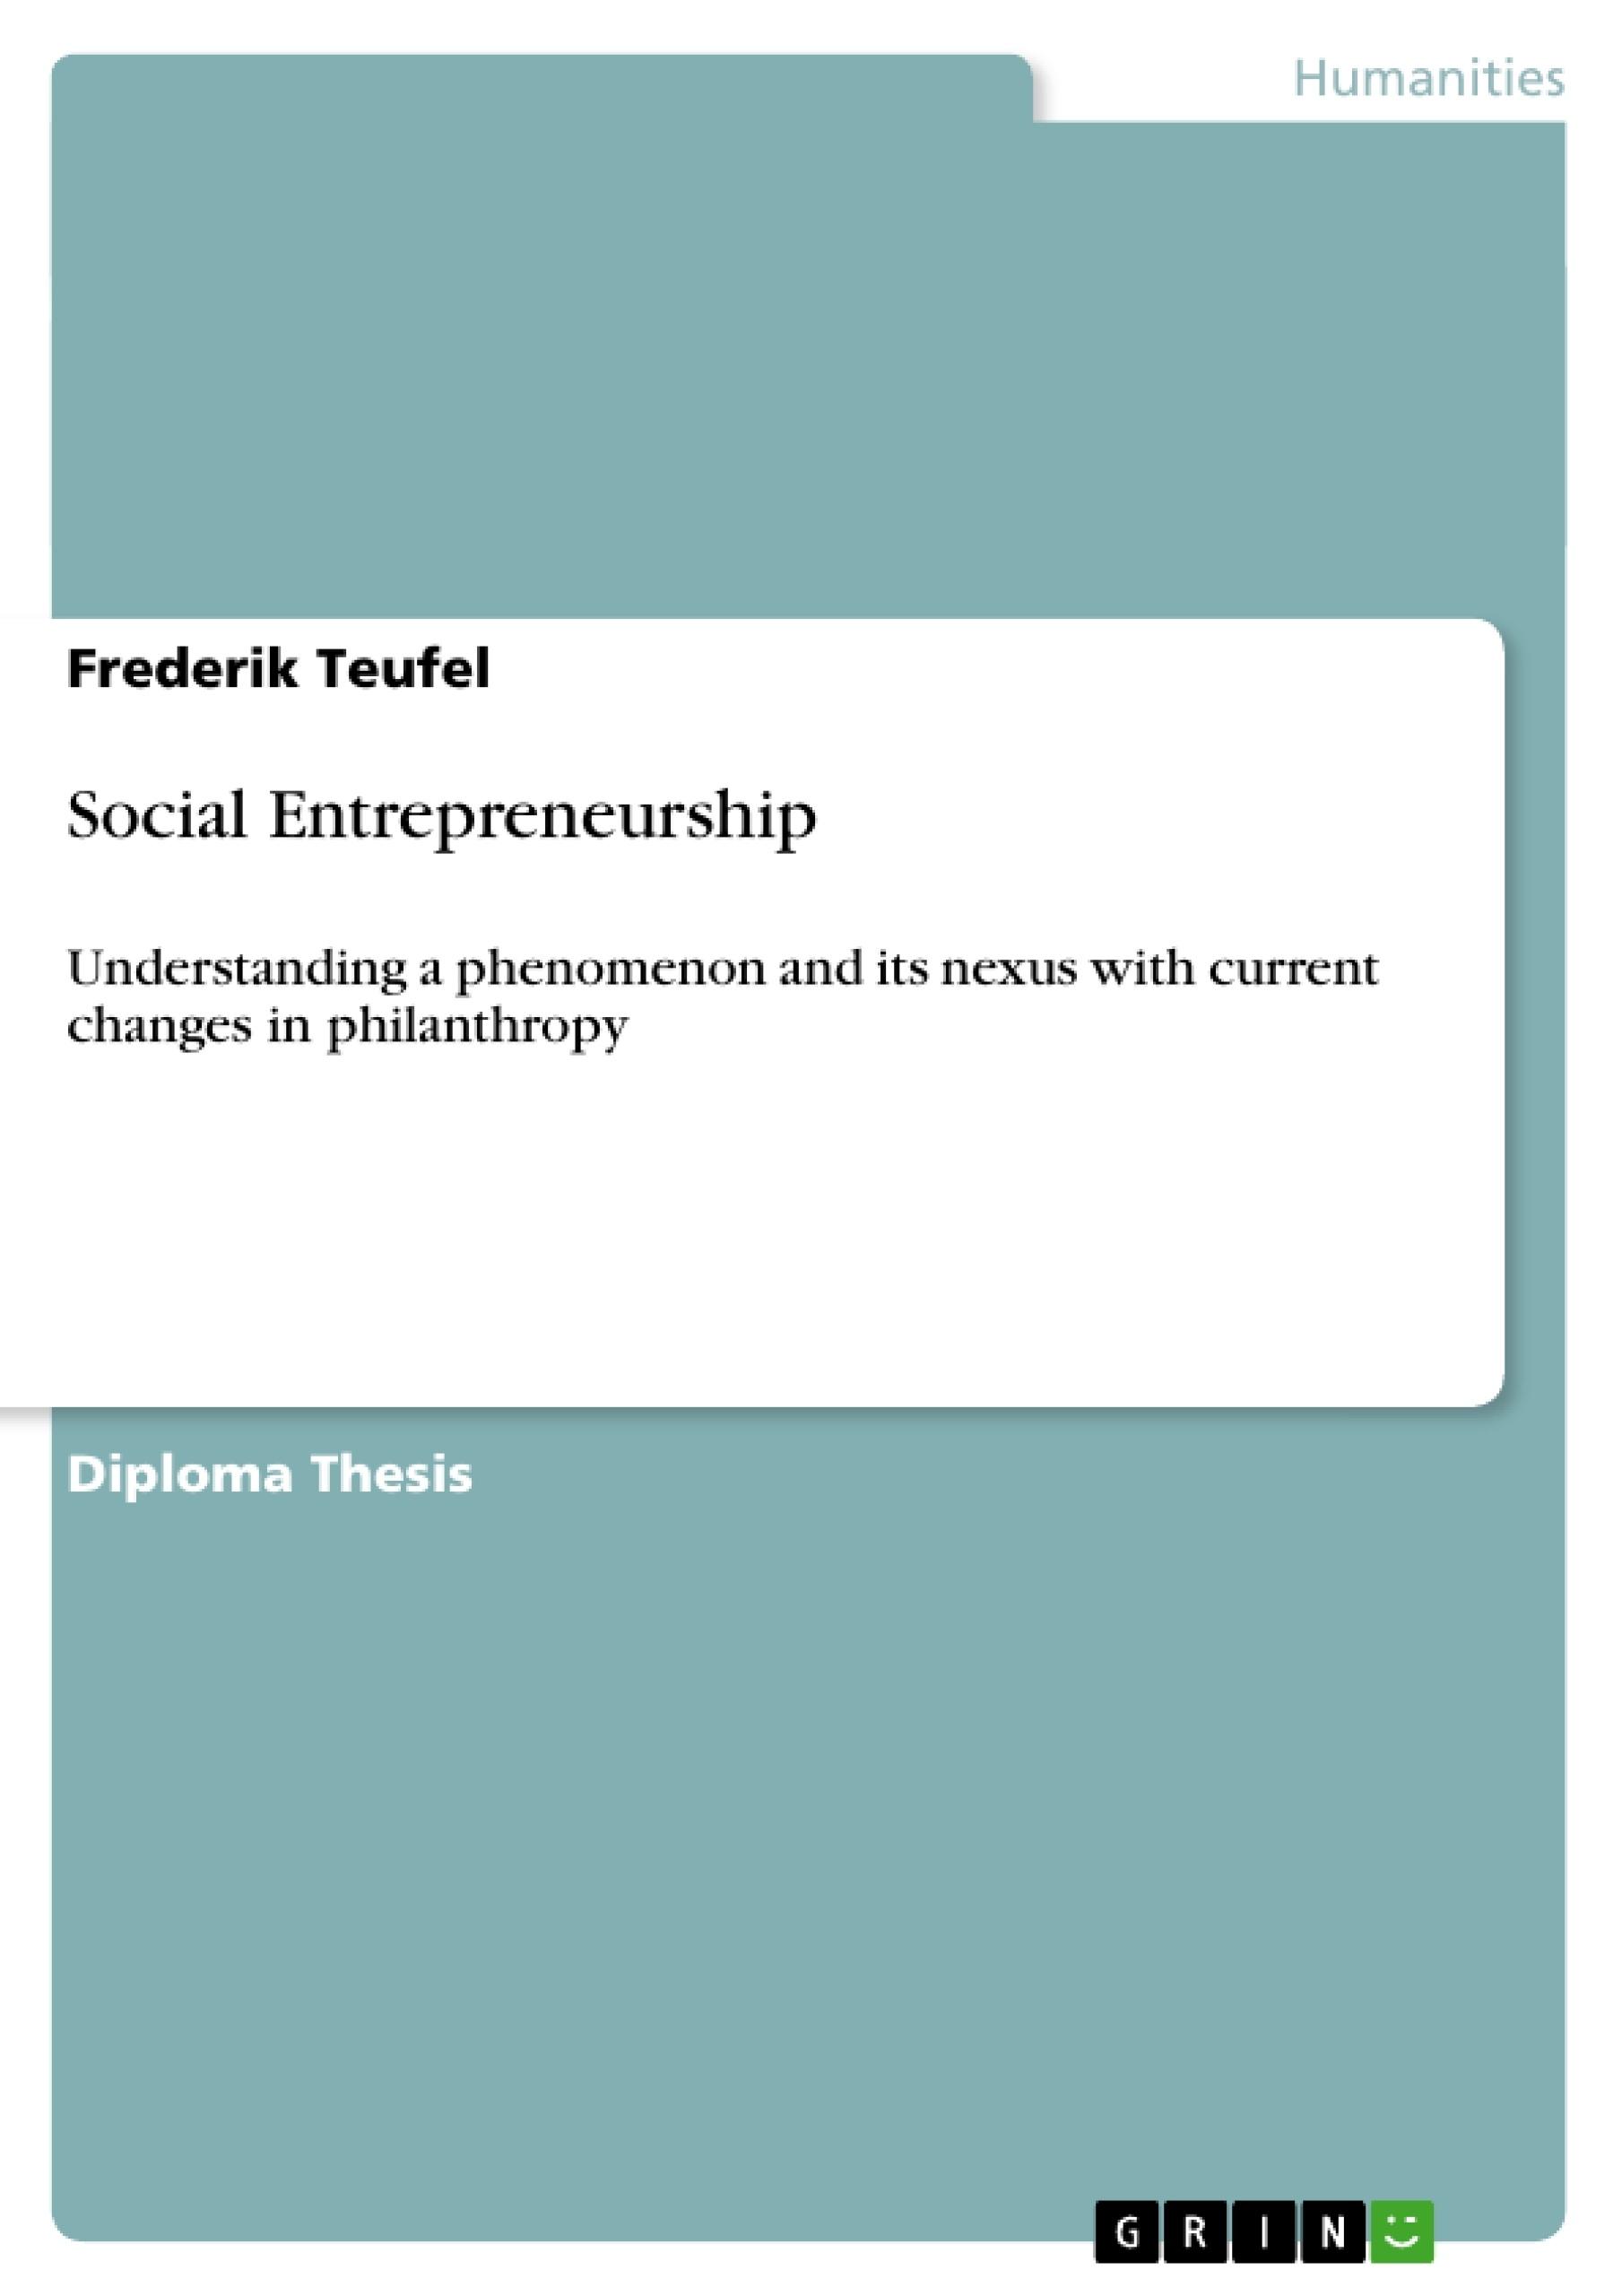 Title: Social Entrepreneurship